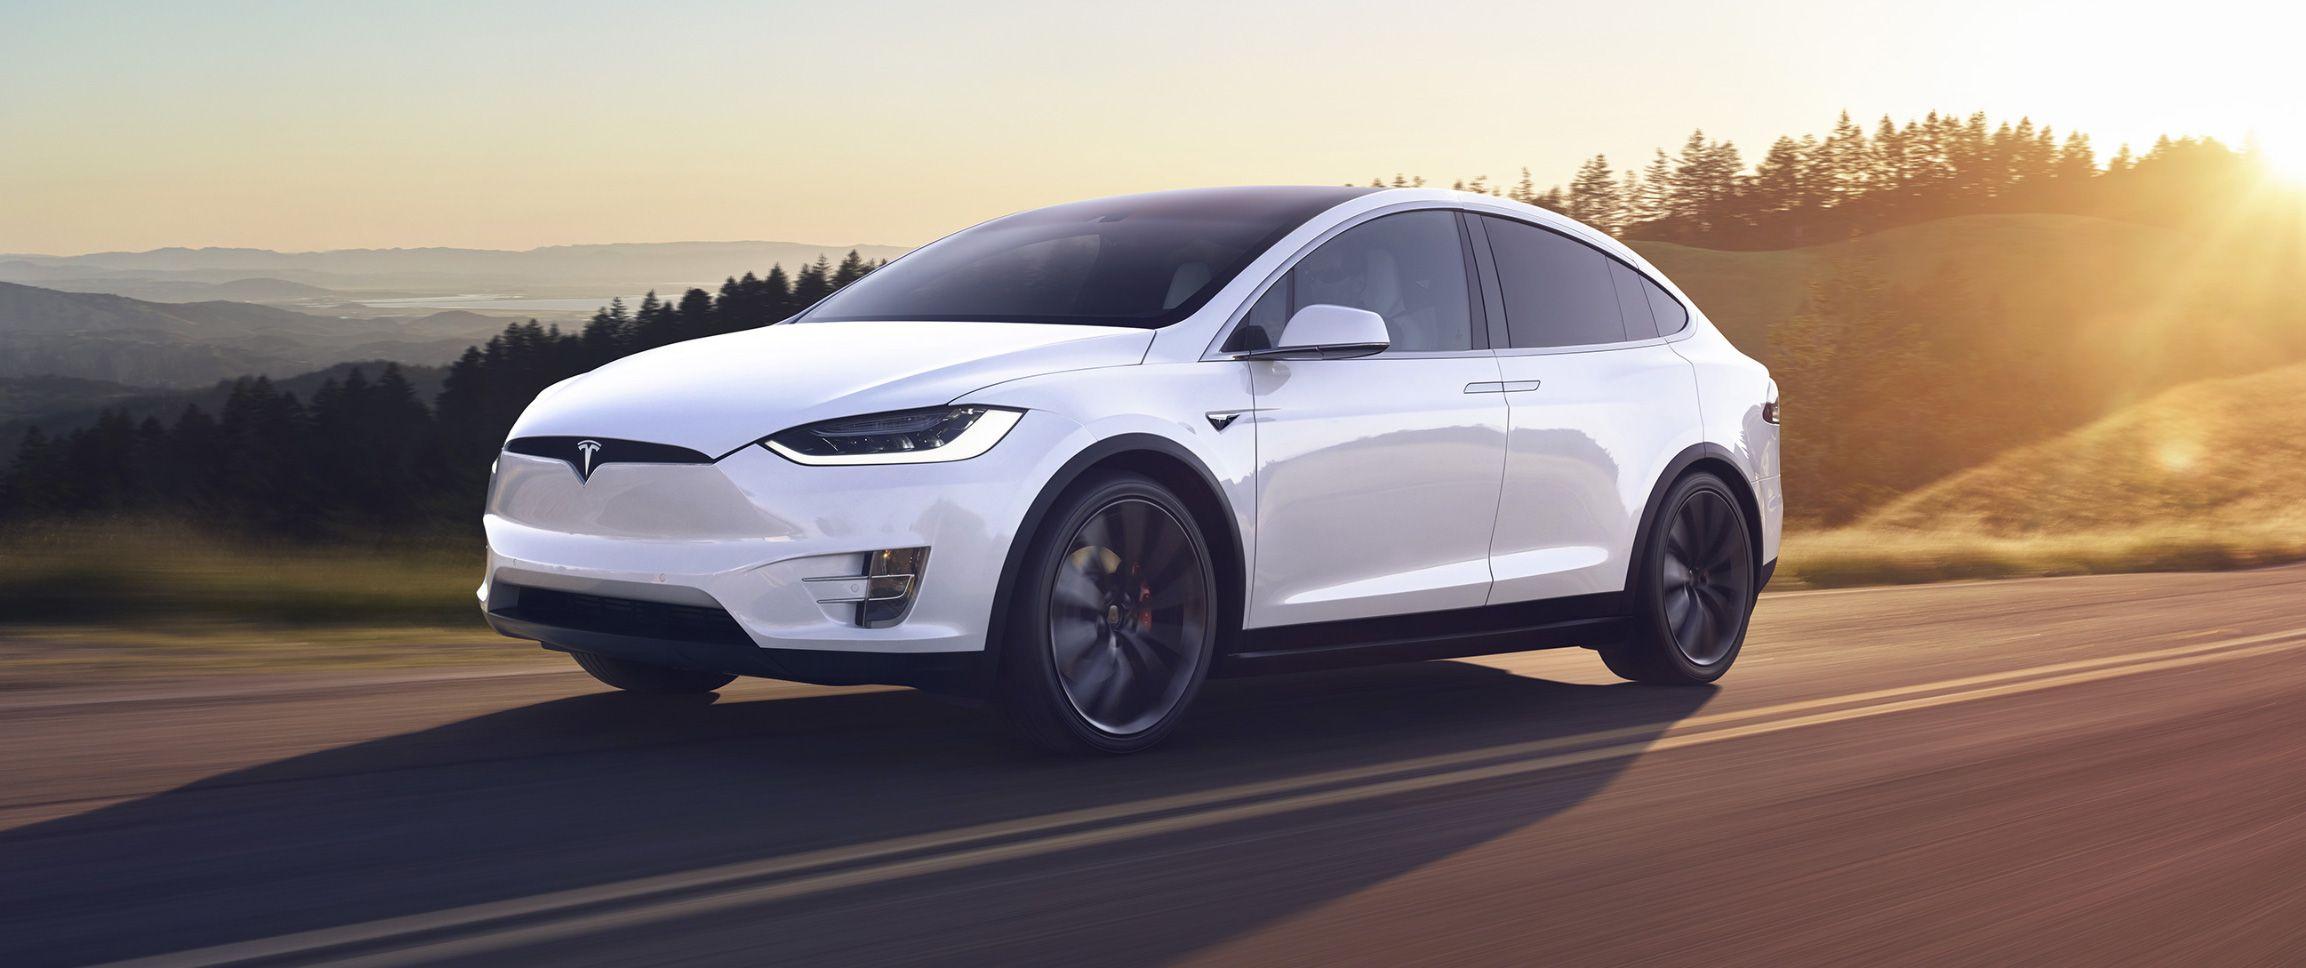 Tesla model s performance price